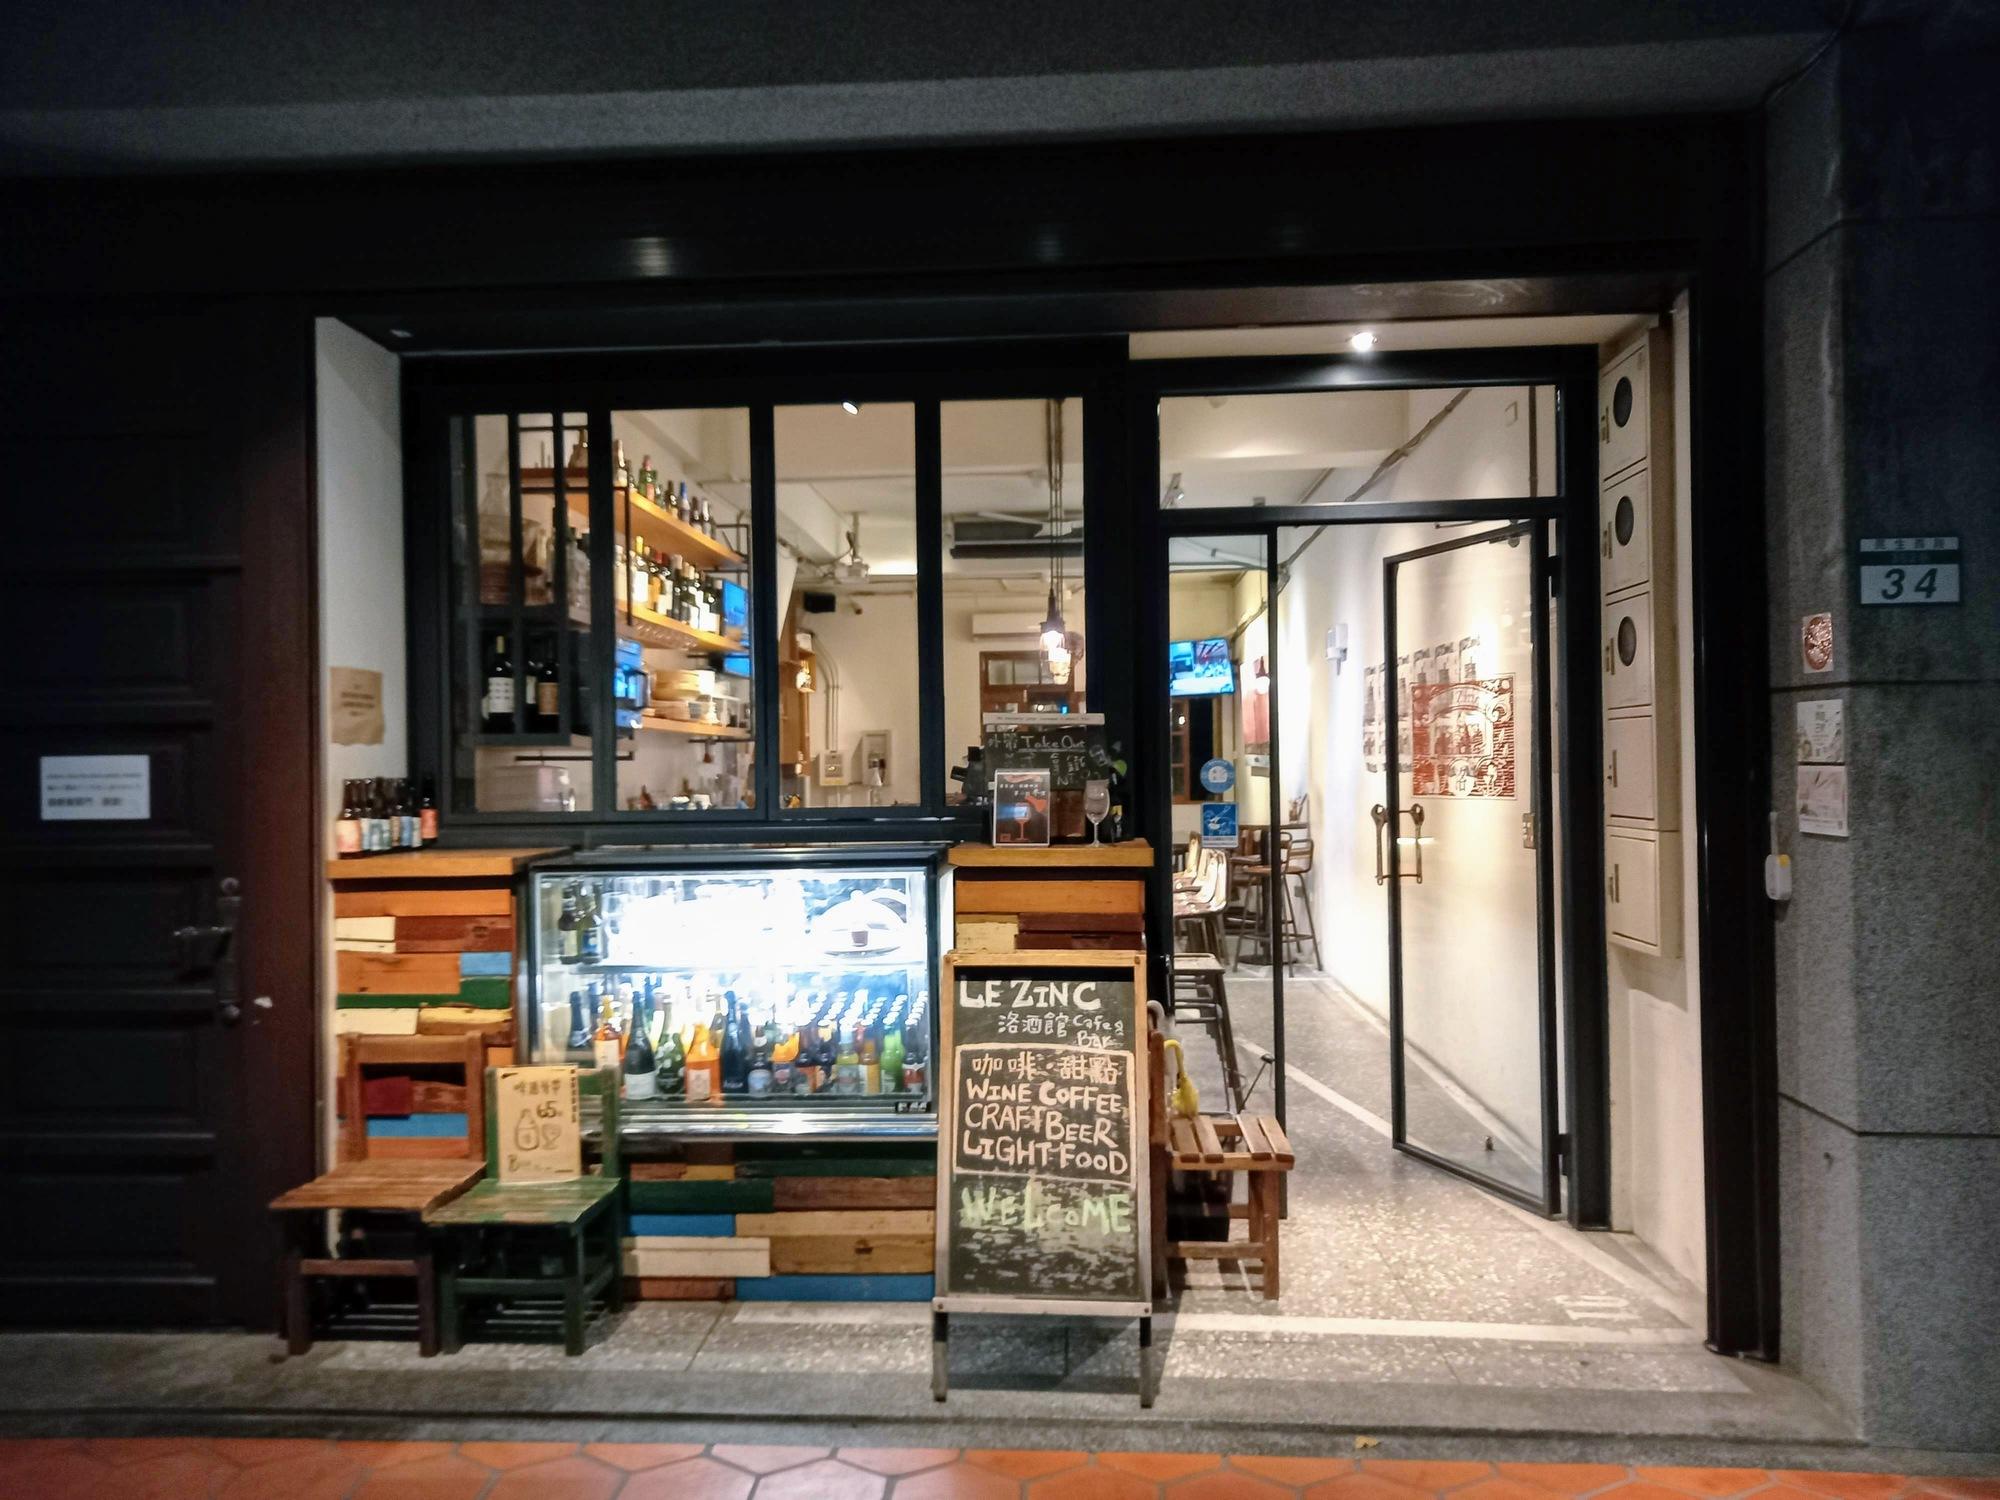 LeZinc Café & Bar, Dihua St. Dadaocheng 大稻埕